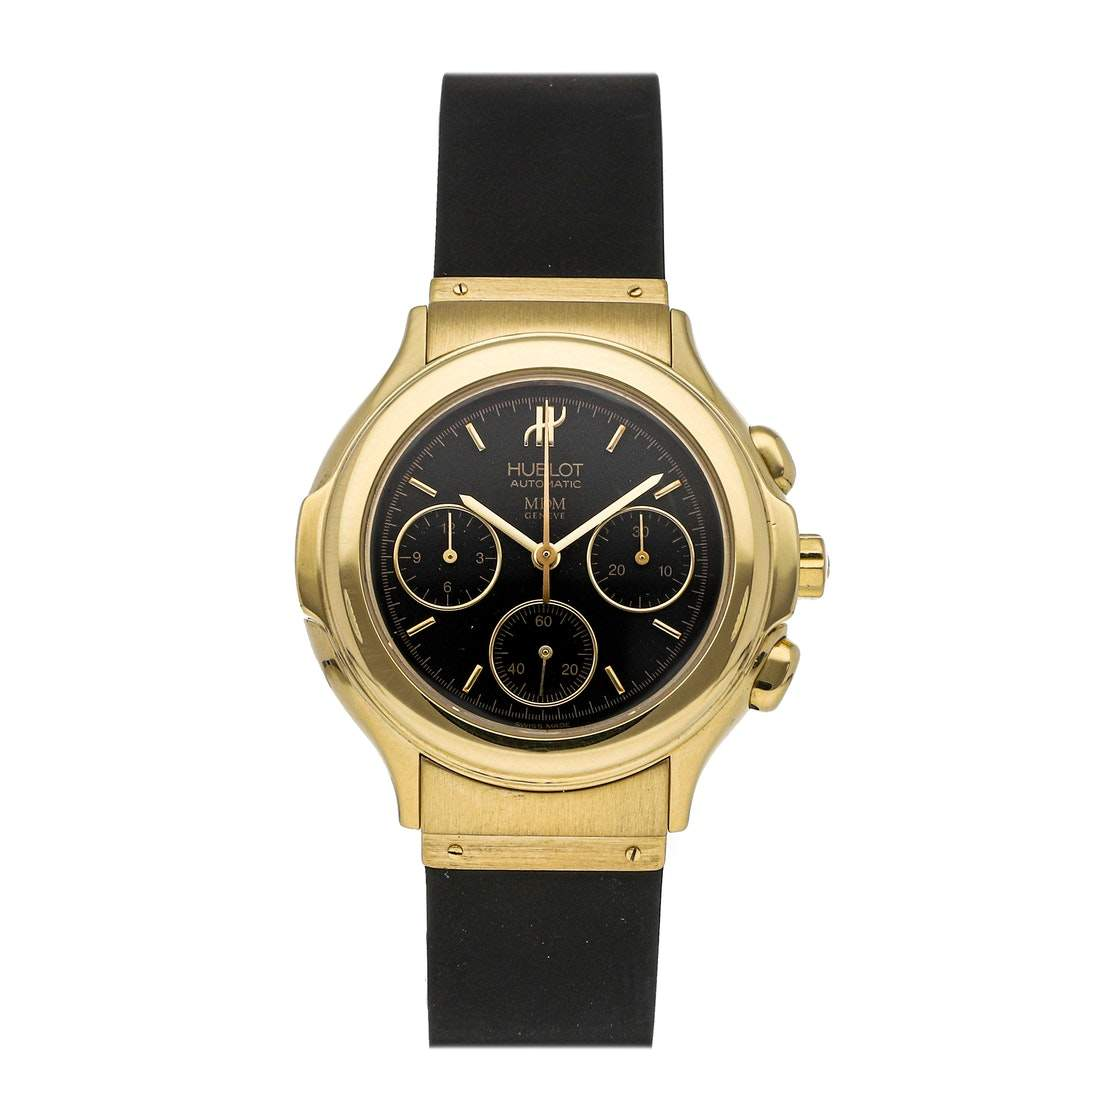 Hublot Black 18K Yellow Gold MDM Chronograph 1610.110.3 Men's Wristwatch 37 MM